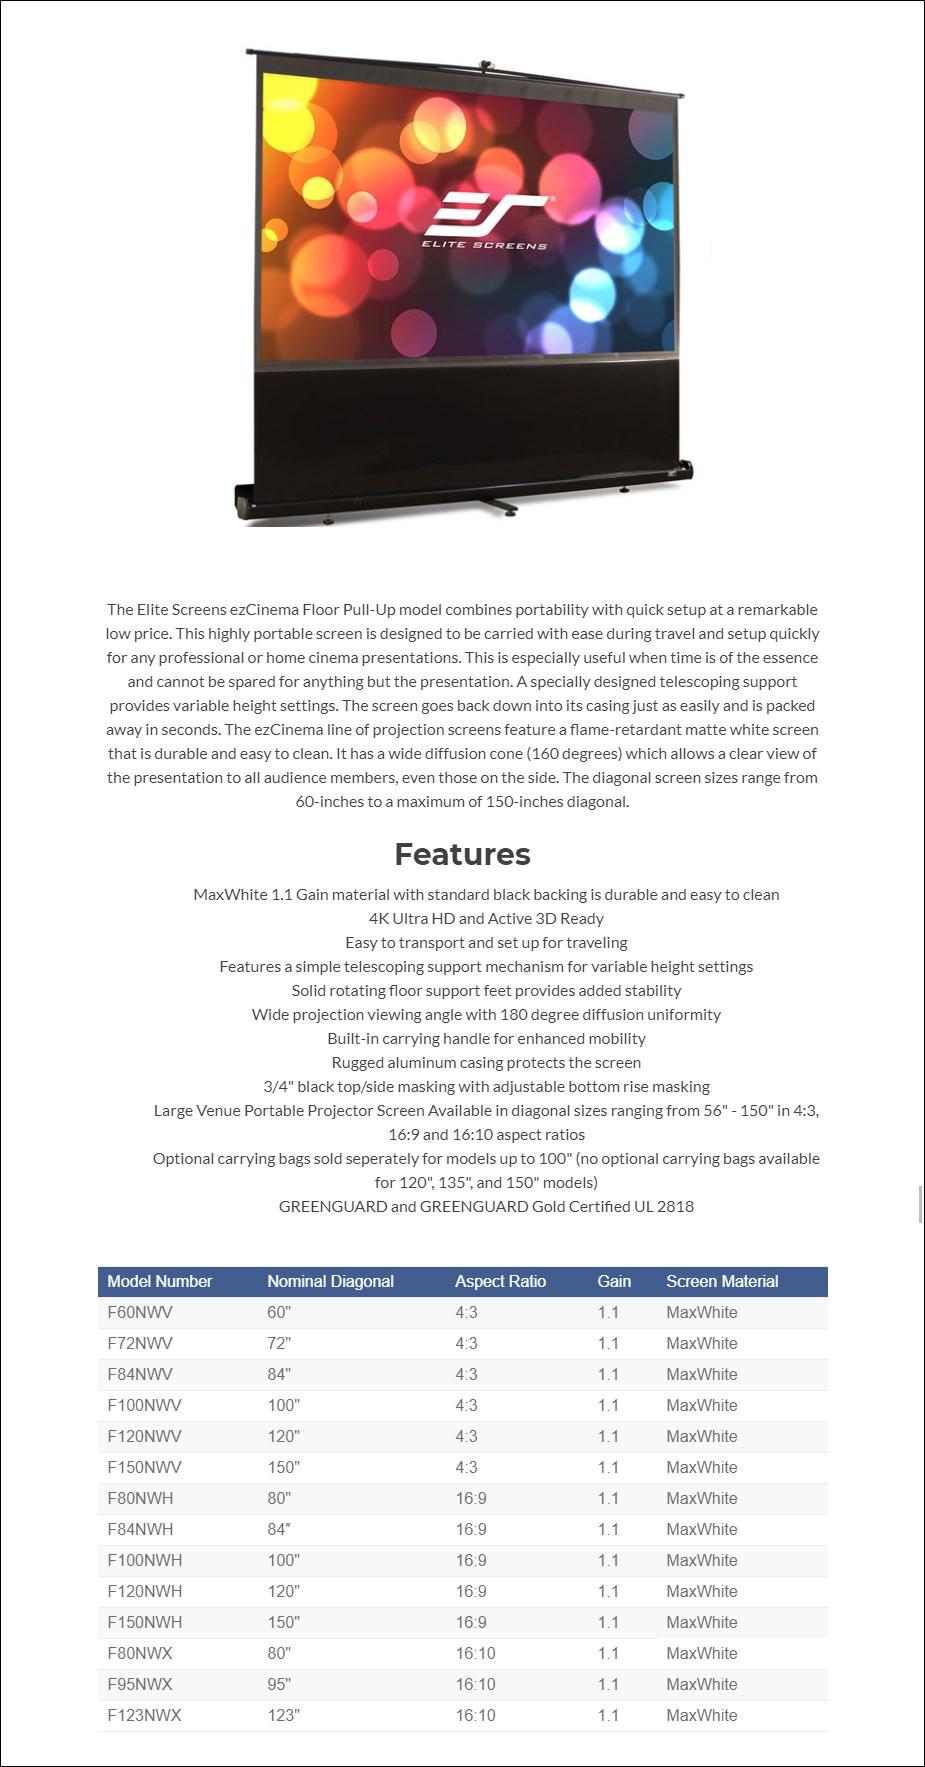 elite-screens-ezcinema-60-43-floor-pullup-projection-screen-ac30909-1-12-.jpg